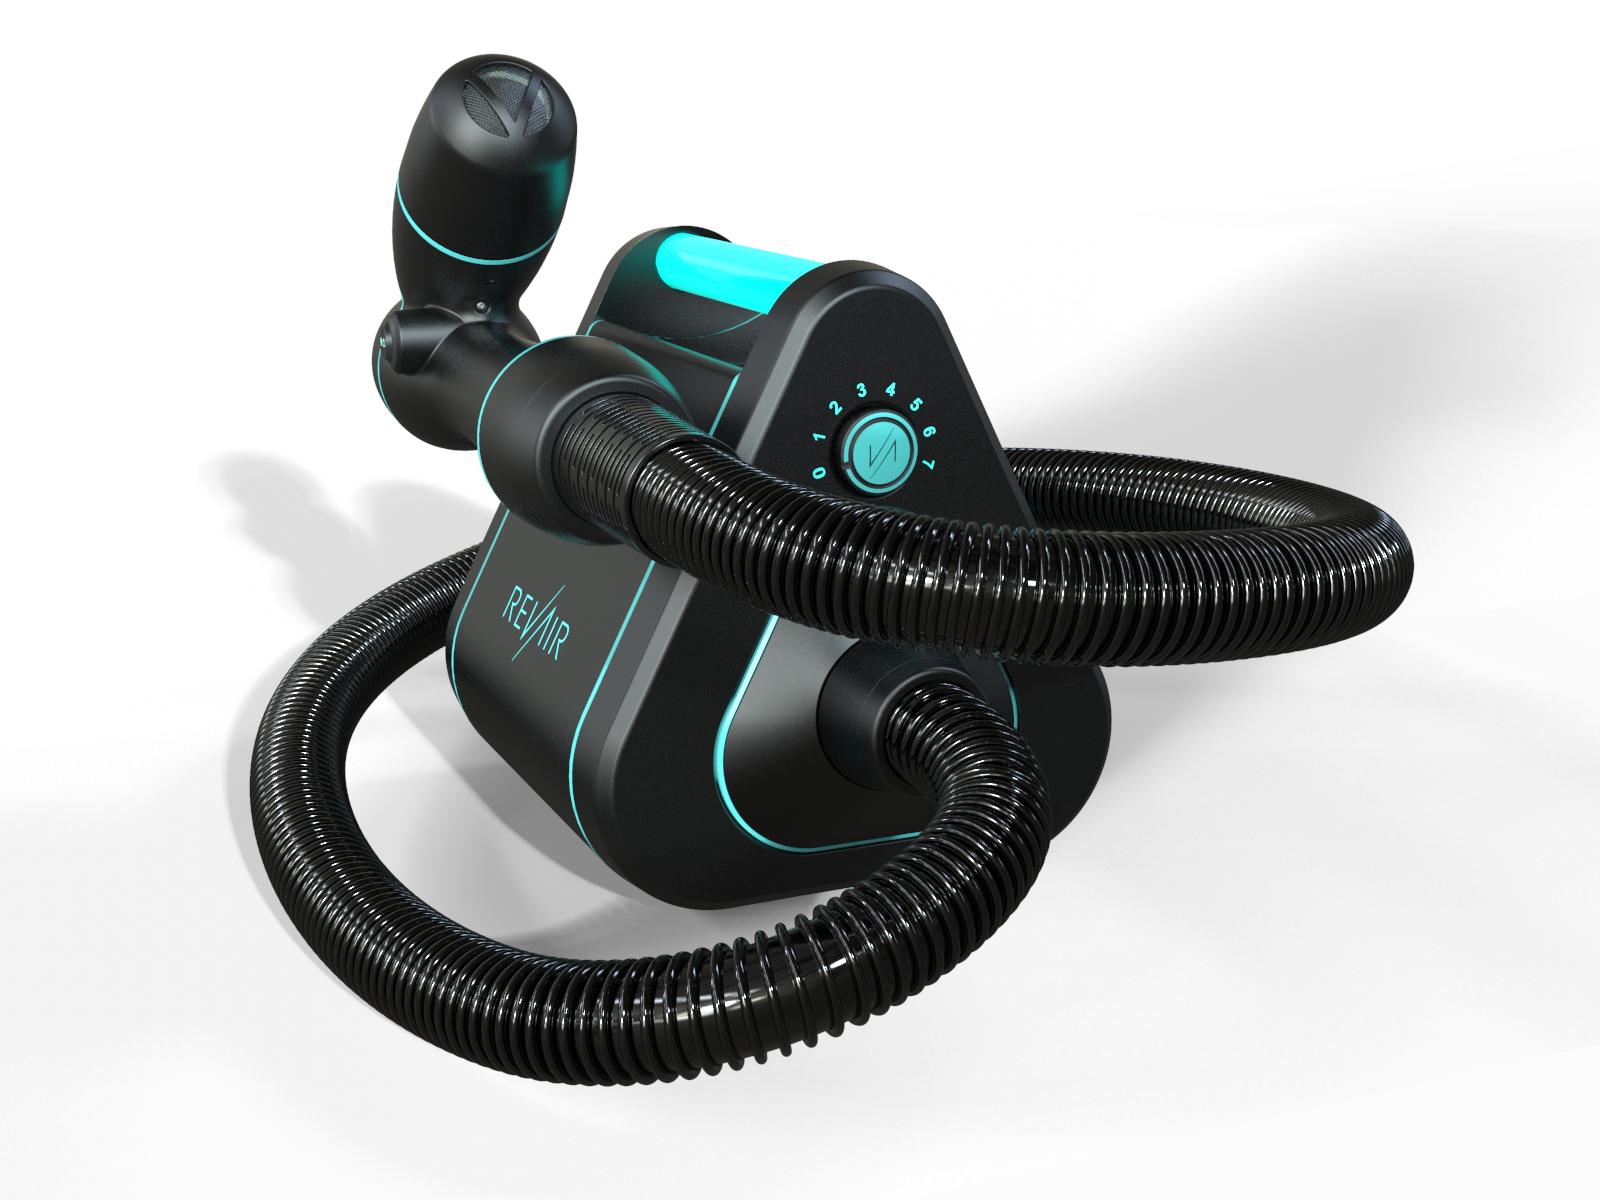 REVAIR reverseair dryer (With images) Air hair dryer